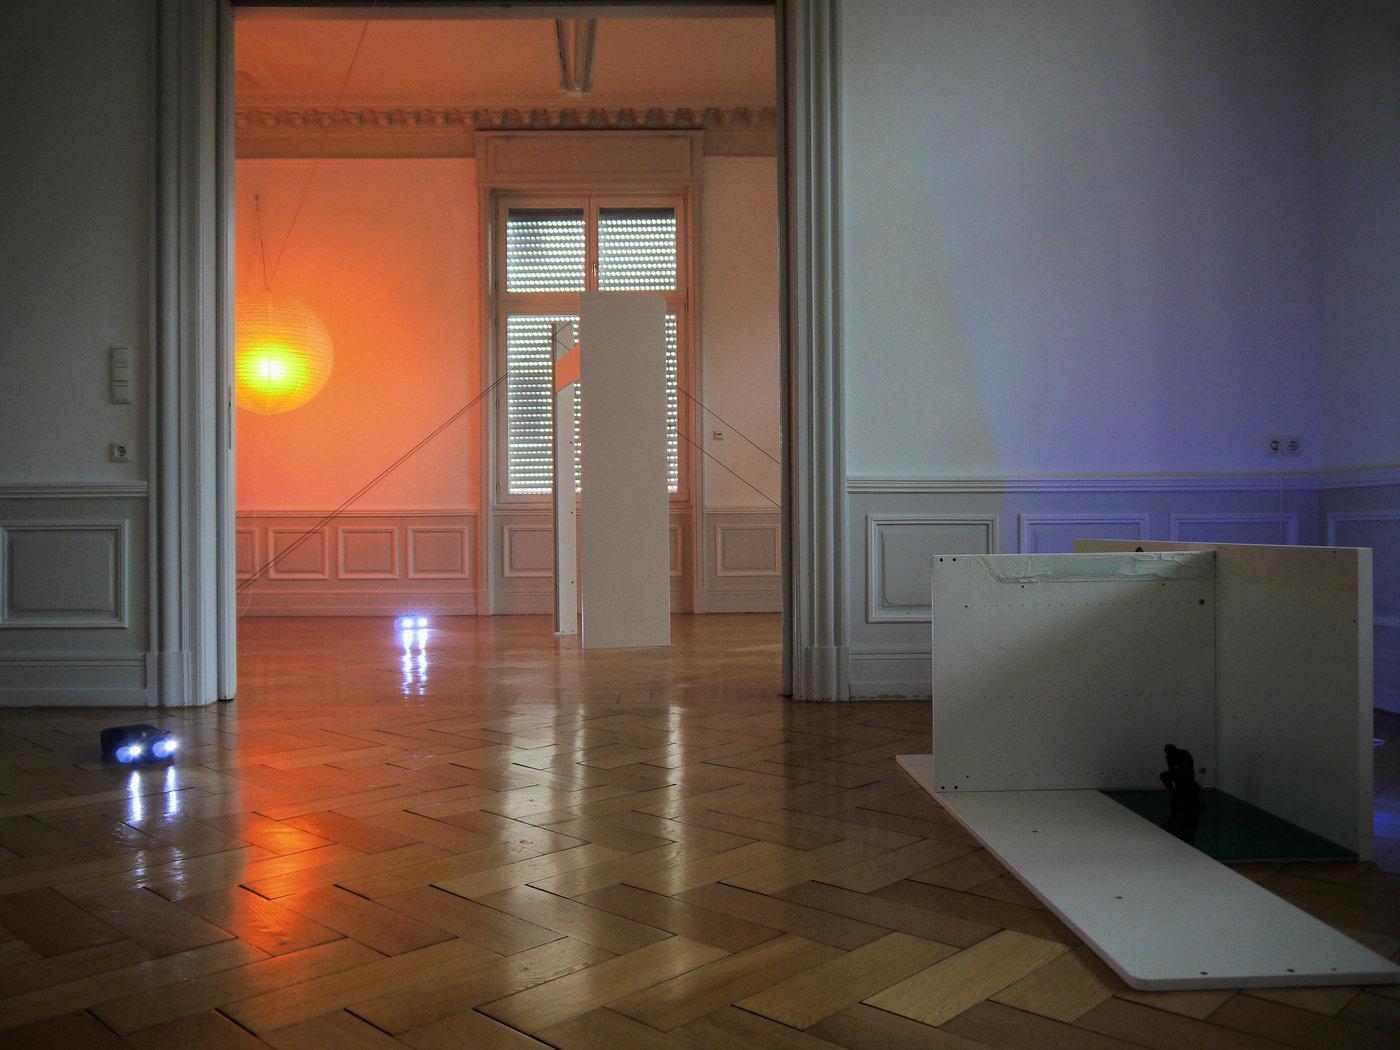 Salon Kennedy_PITFALLS_Benedikte Bjerre_Money over World_Frankfurt_Cultural Avenue_F